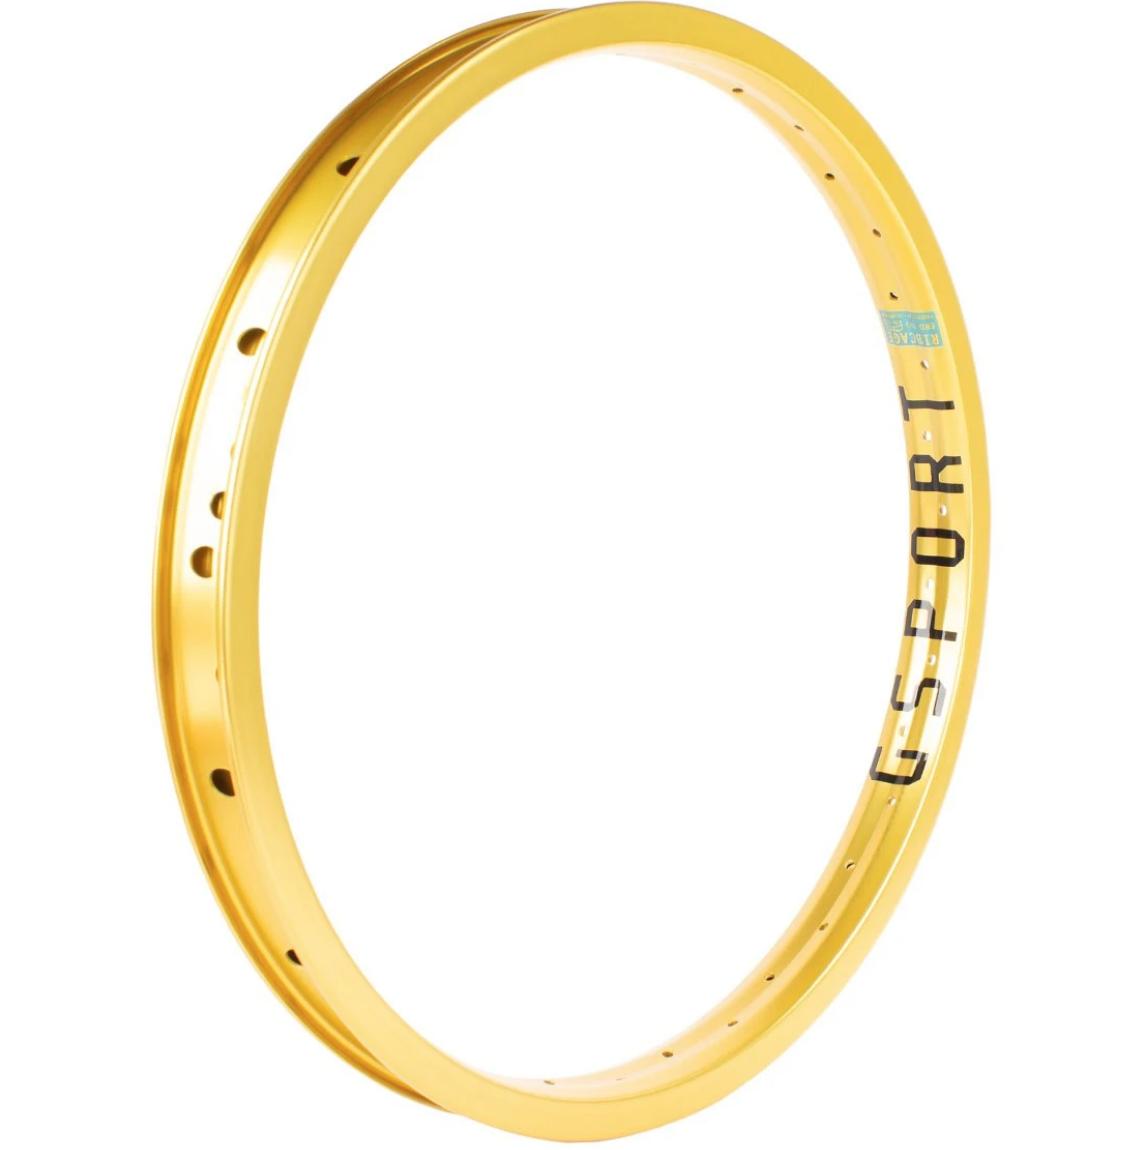 G-sport Ribcage Cerchio Bmx  | Colore Gold